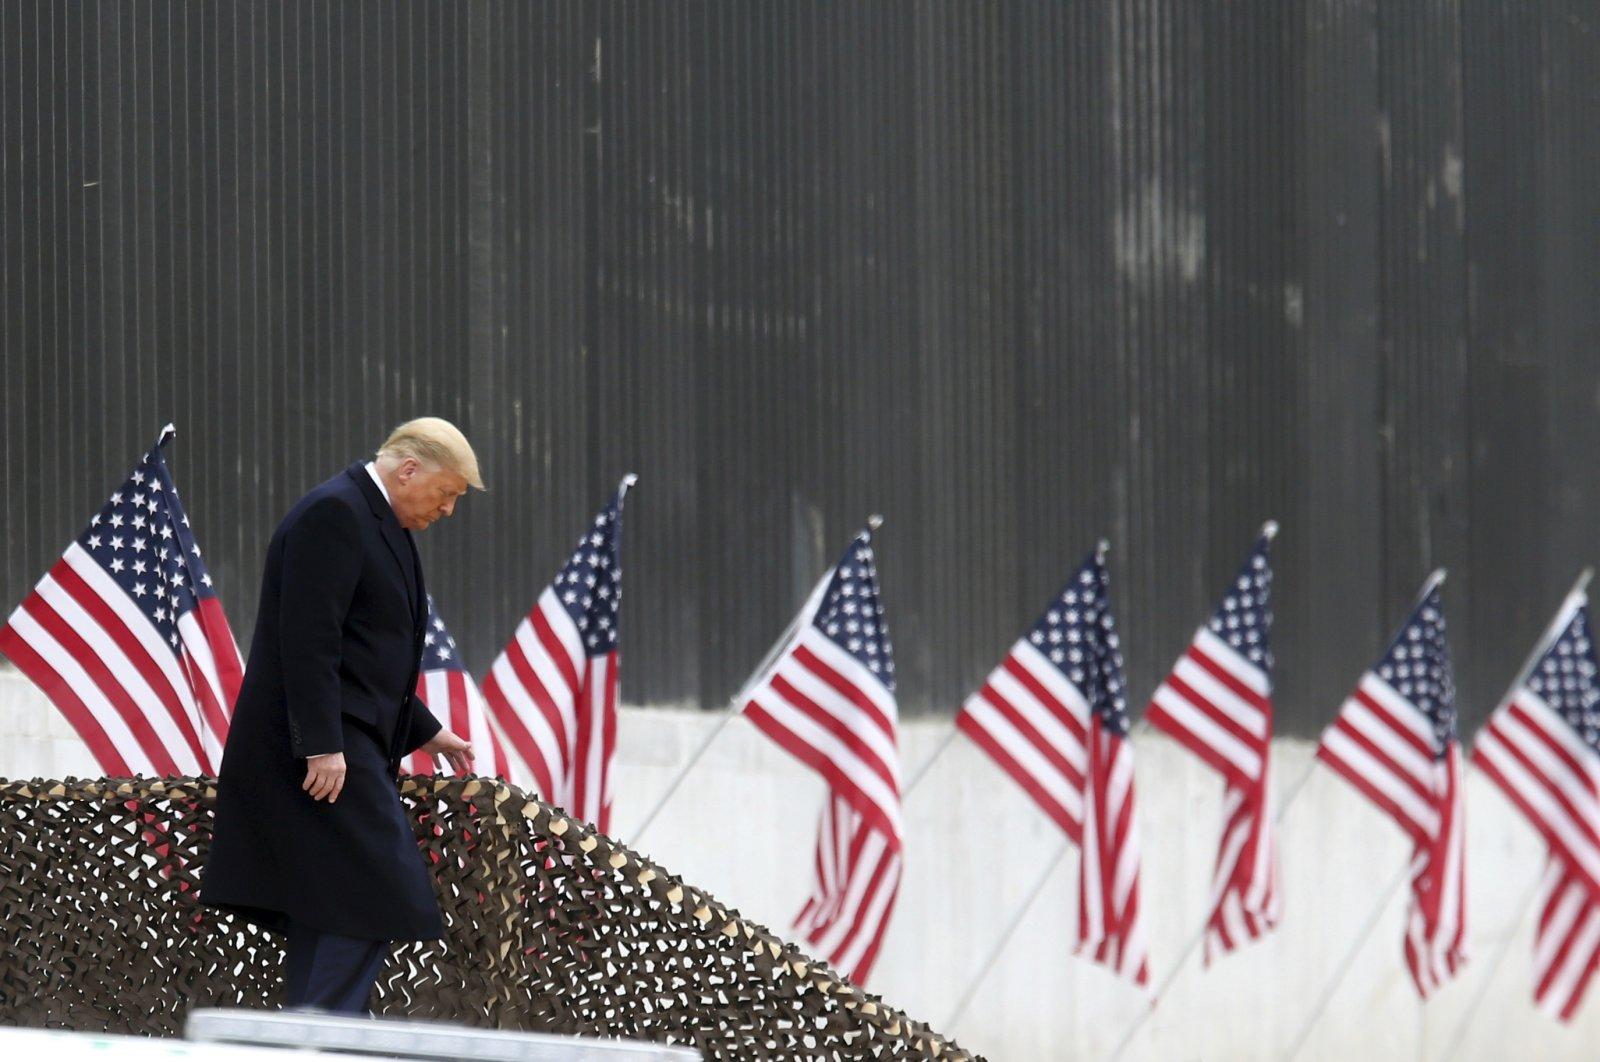 President Donald Trump walks down the steps before a speech near a section of the U.S.-Mexico border wall, Alamo, Texas on Jan. 12, 2021. (AP Photo)